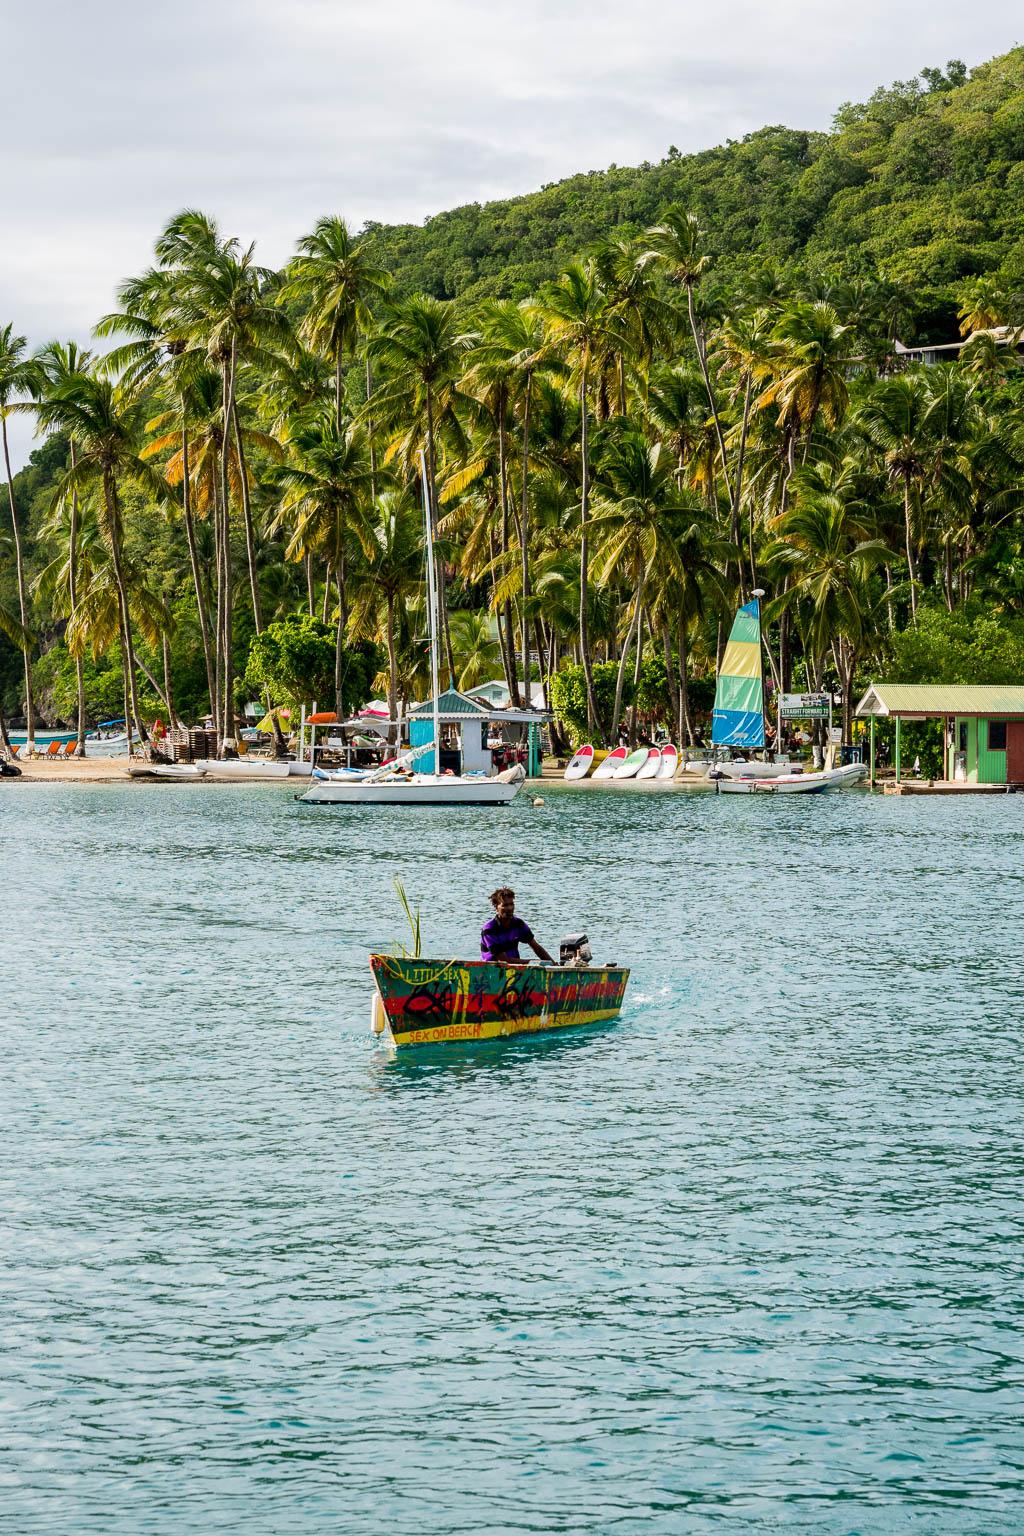 Fischerboot Marigot Bay Saint Lucia